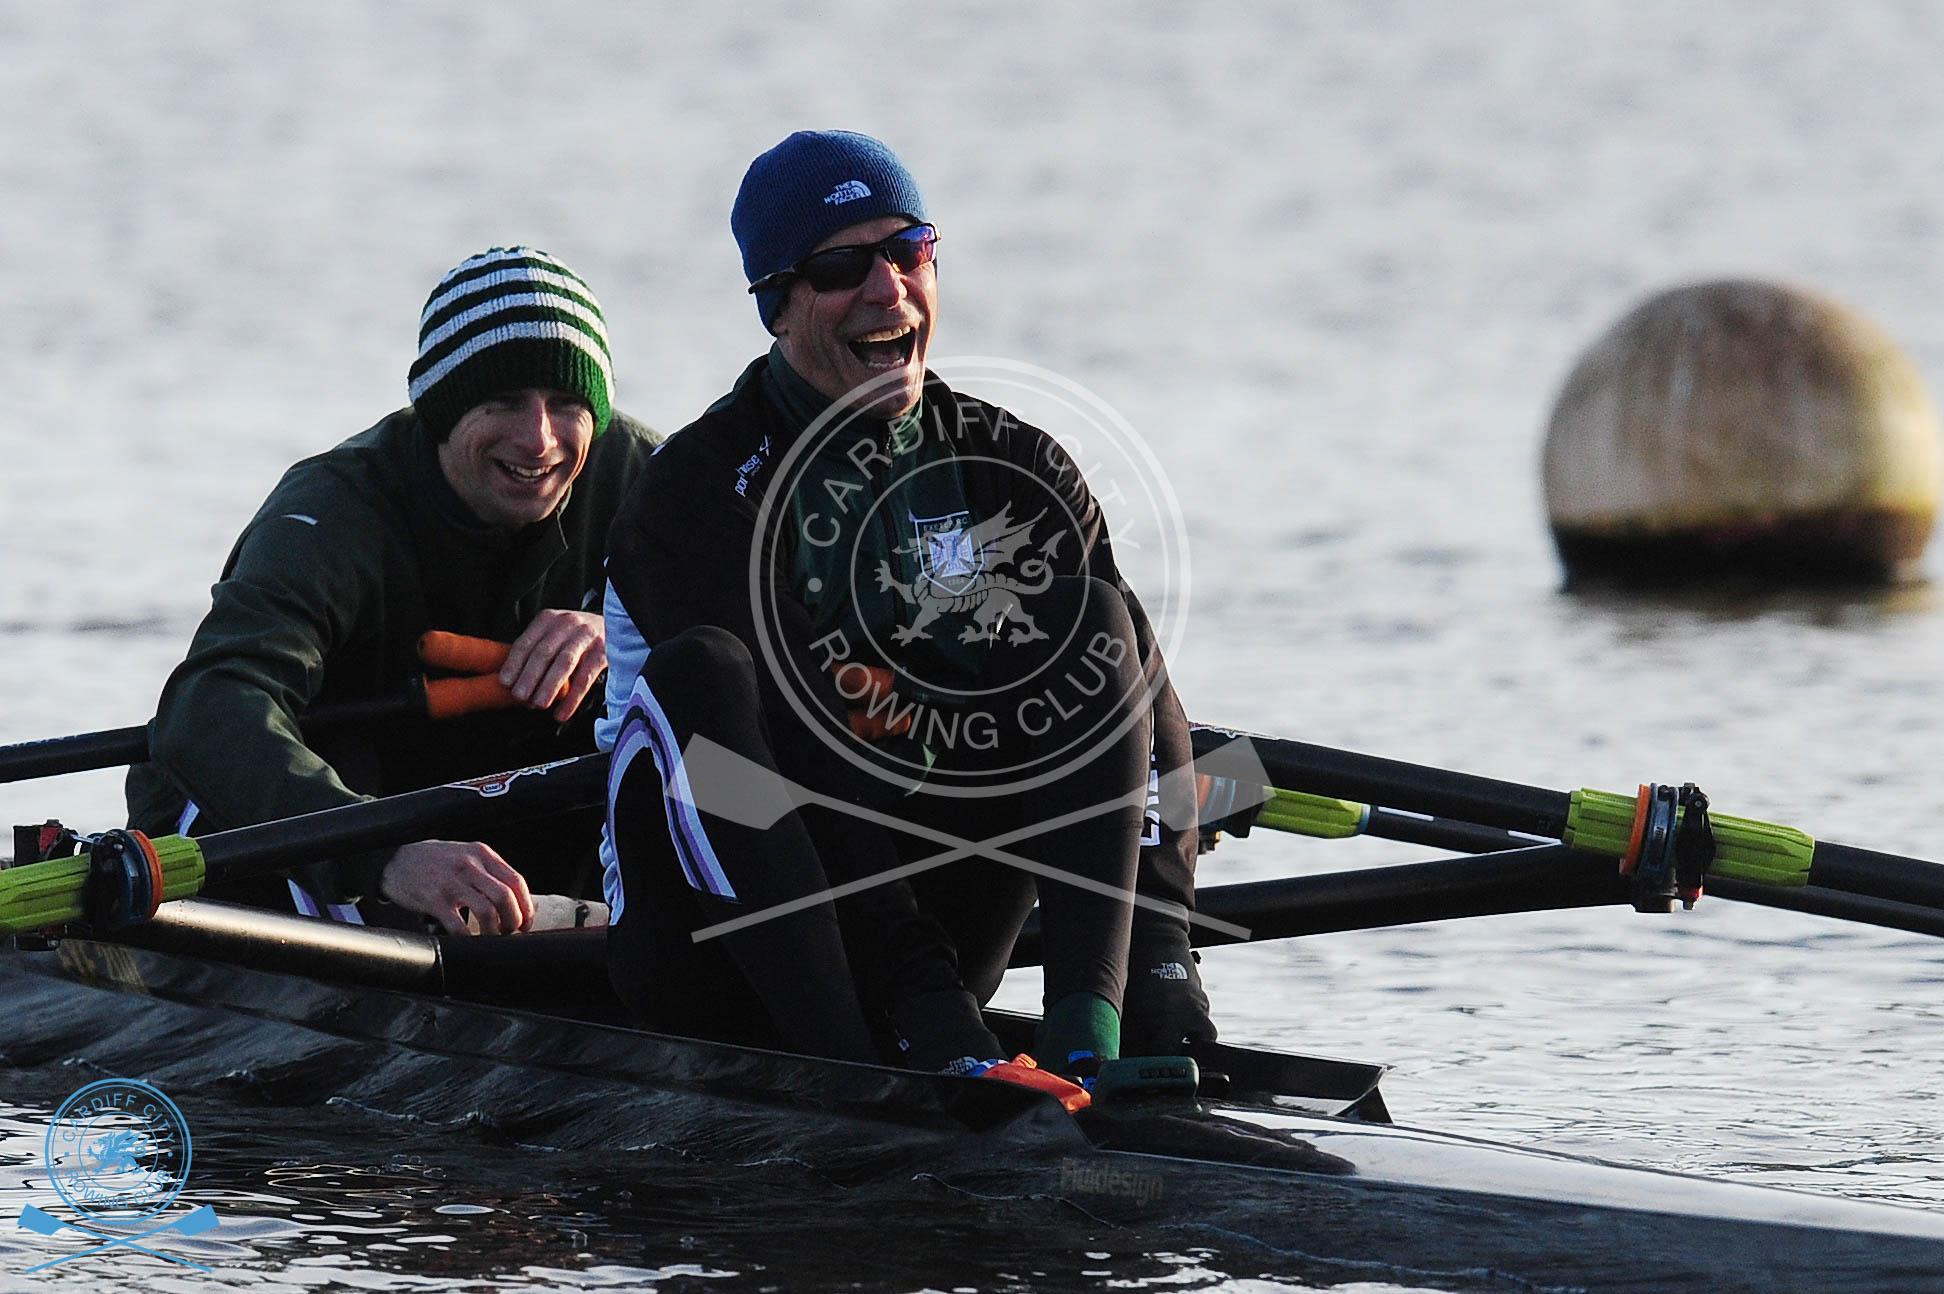 DW_280119_Cardiff_City_Rowing_15.jpg